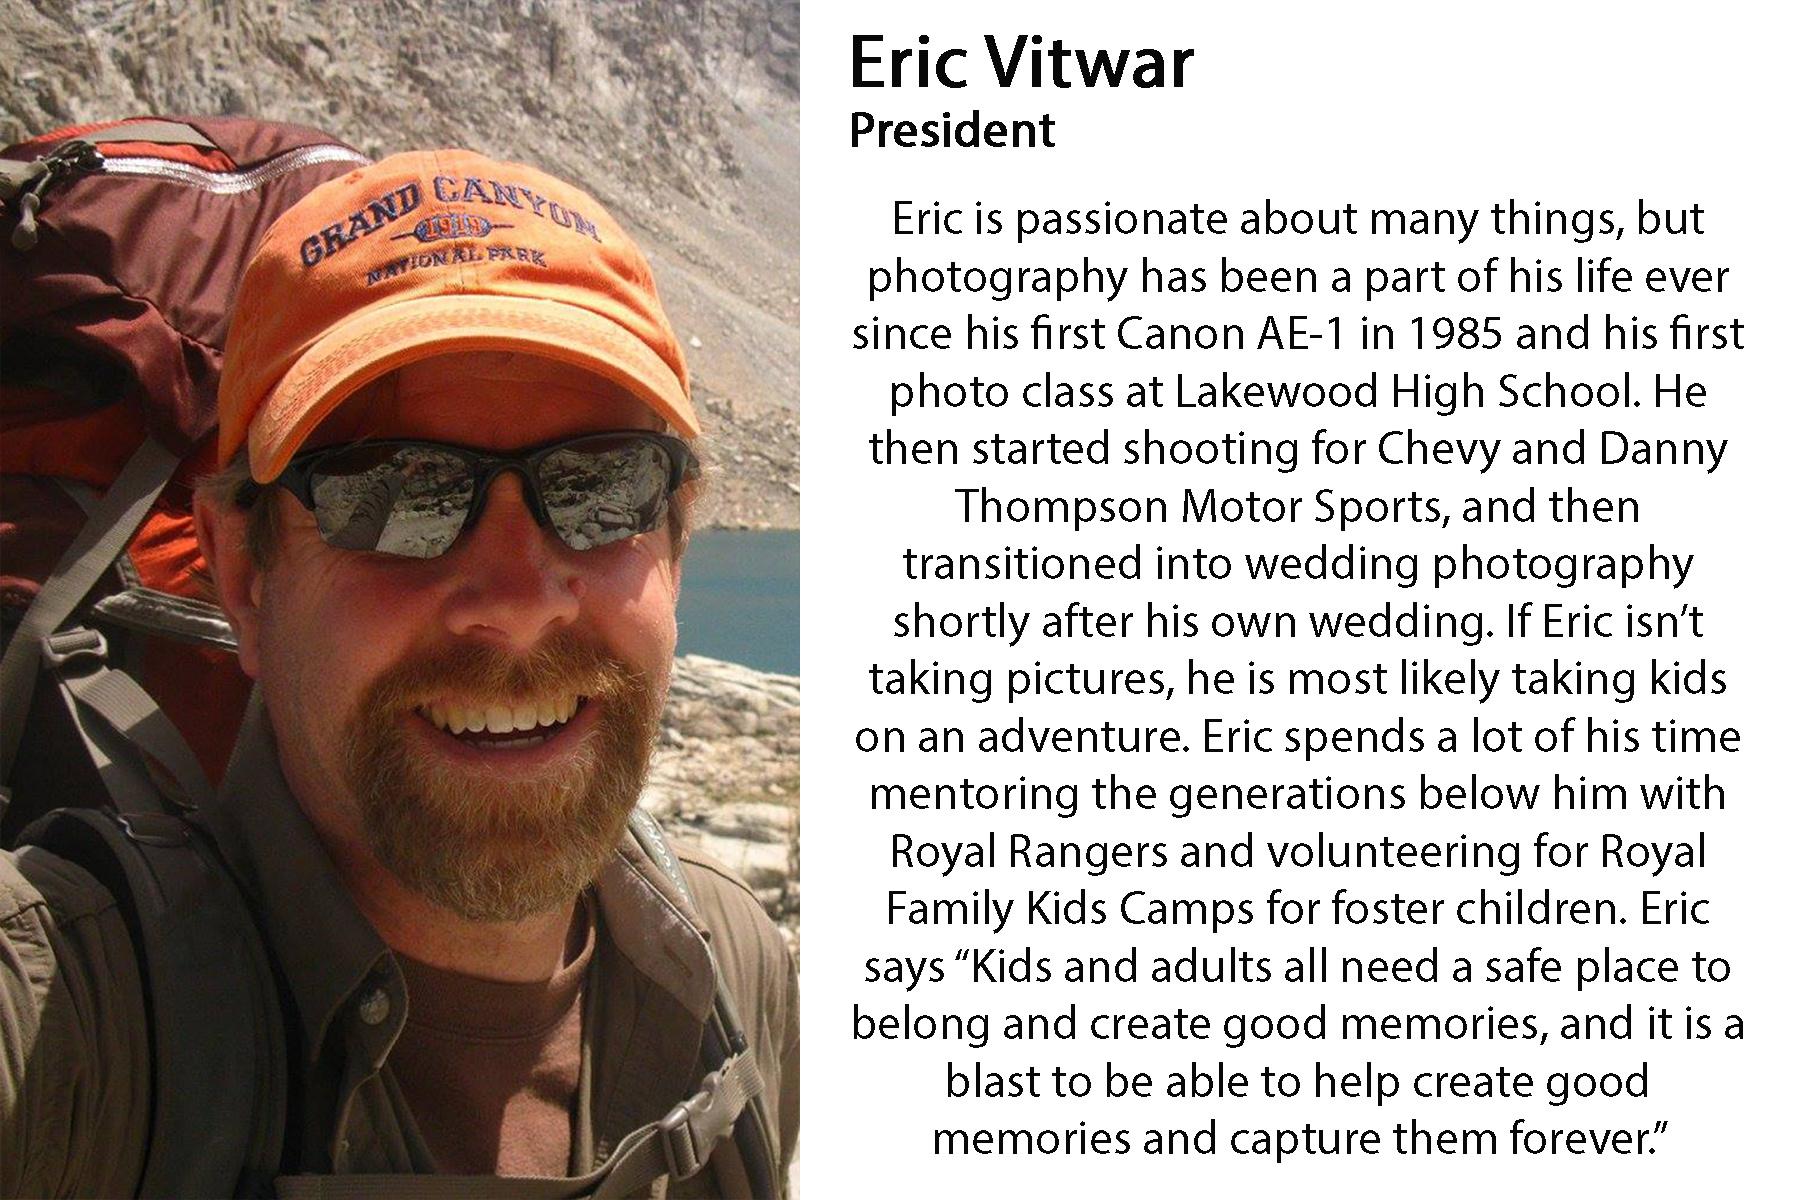 Eric Vitwar